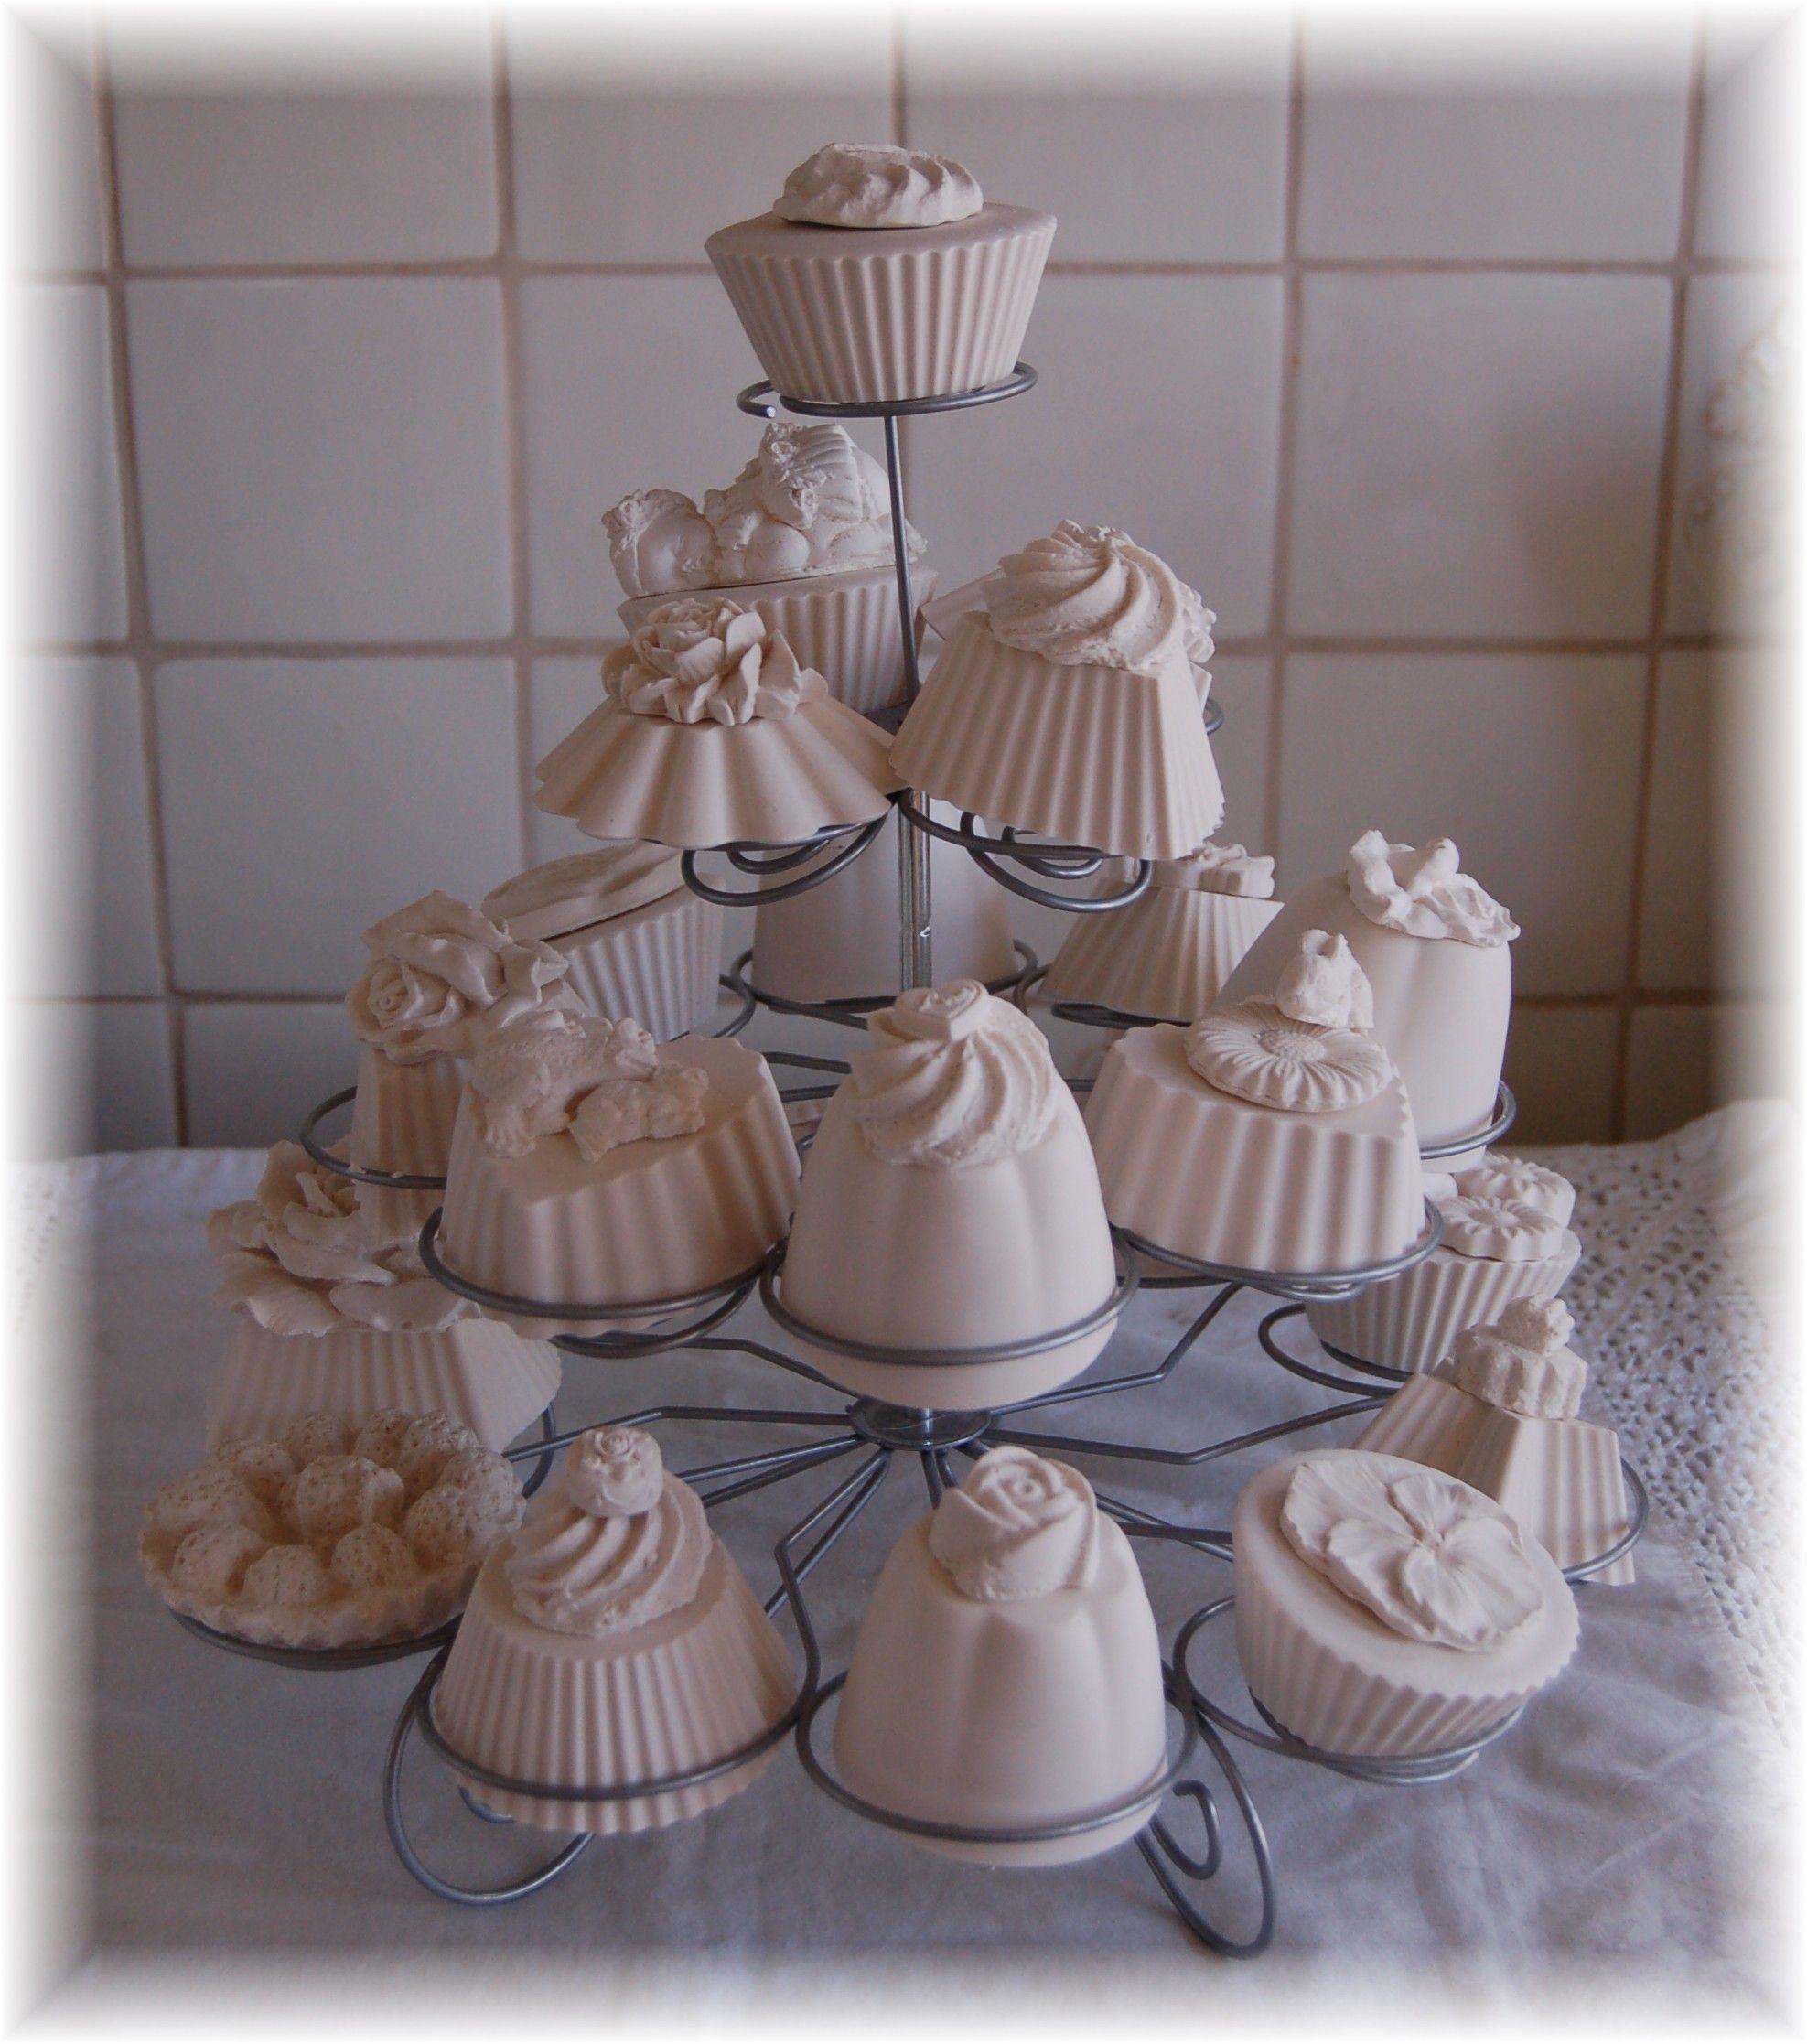 Geursteen Muffins Gemaakt Van Gips. Plaster Of Paris, Polymer Clay, Air Dry  Clay